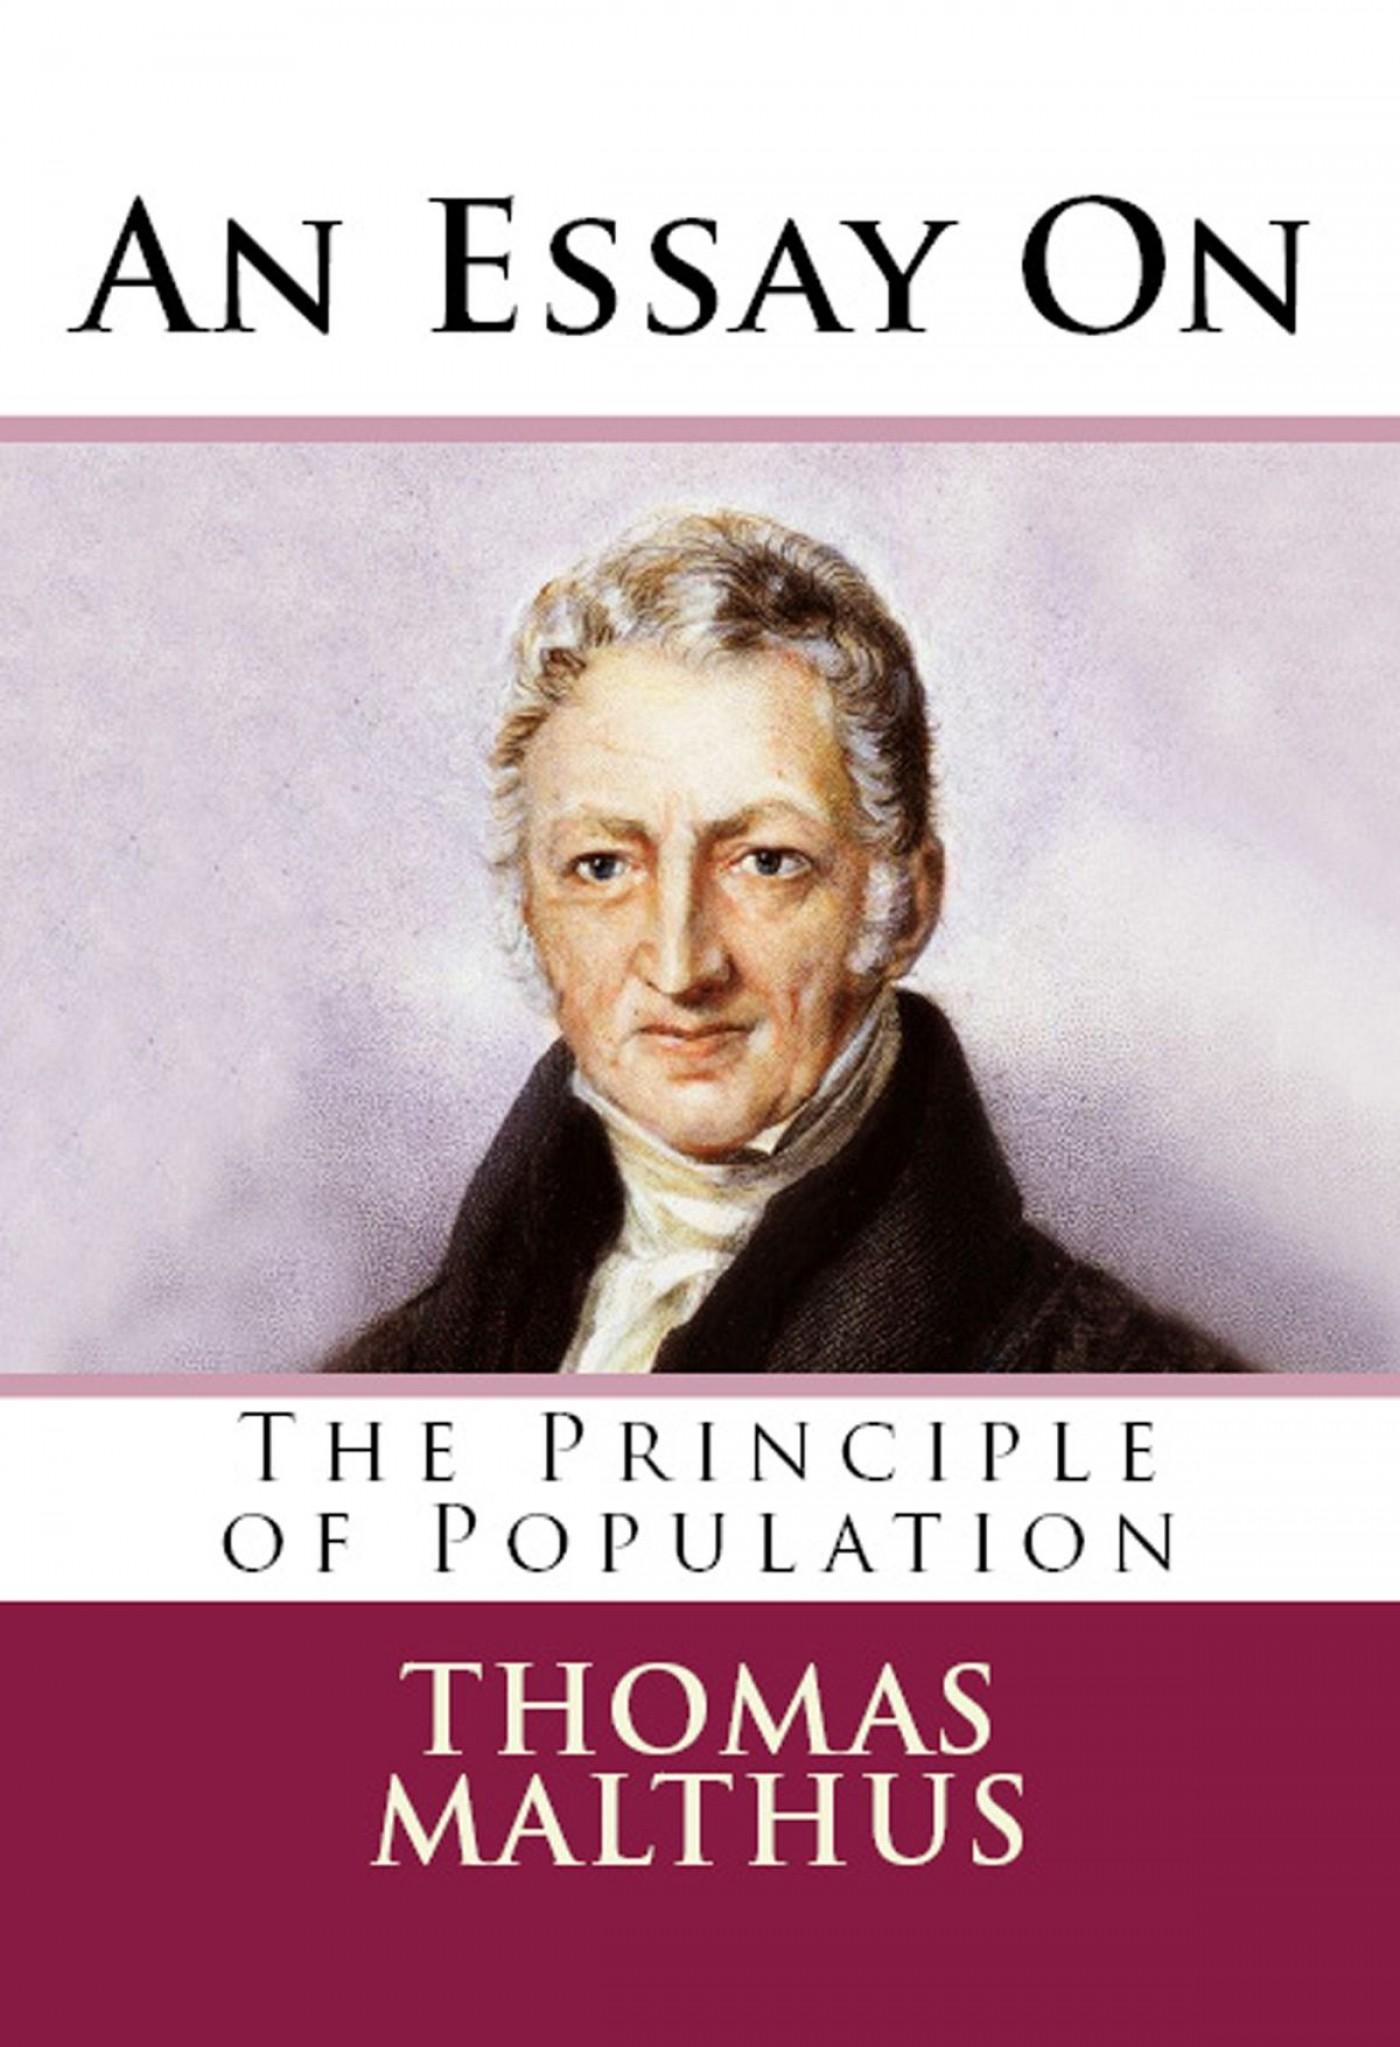 010 Essay On The Principle Of Population An Singular Malthus Sparknotes Thomas Main Idea 1400